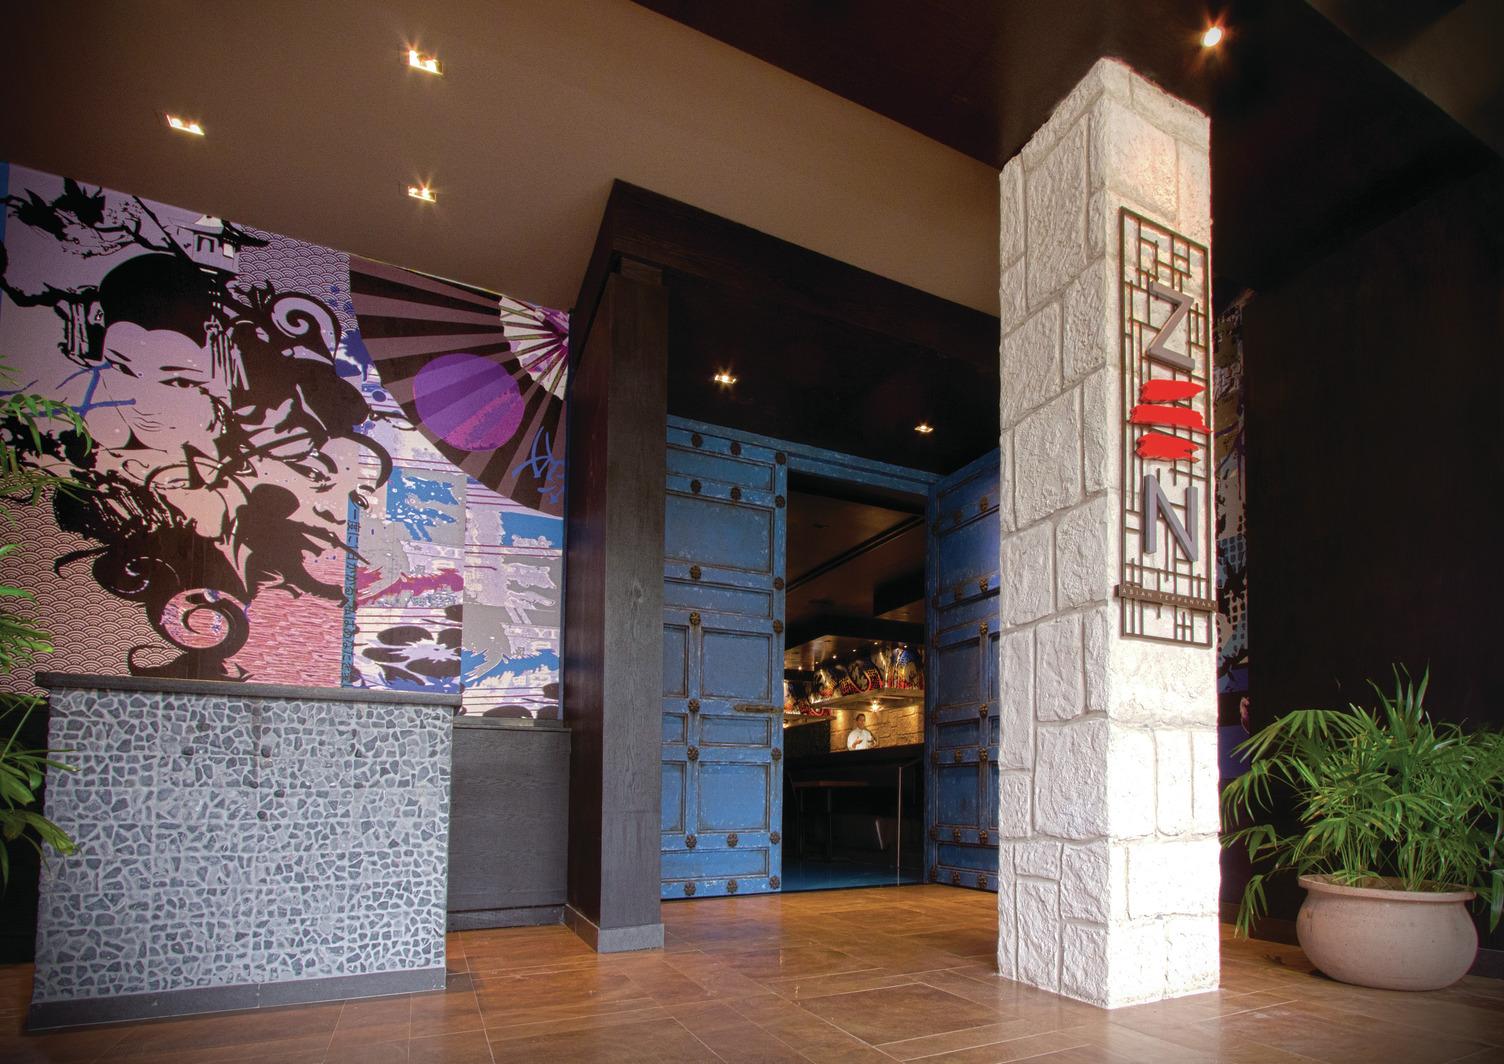 Travel Agency All-Inclusive Resort Heaven at Hard Rock Hotel Riviera Maya 49